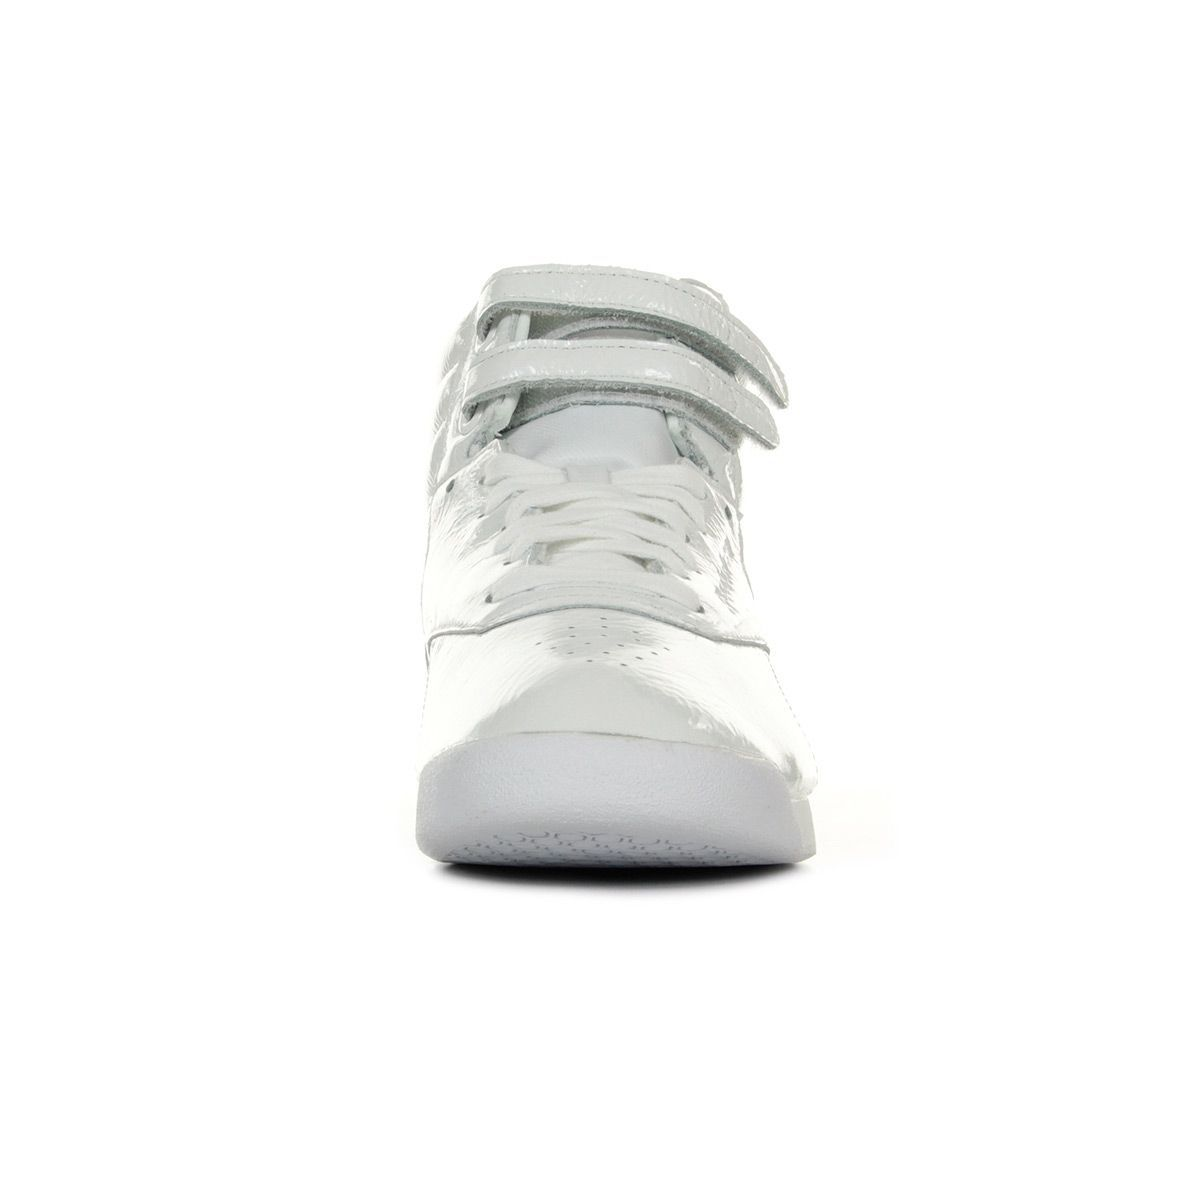 Baskets FS Hi Iridescent | Products | Chaussure basket